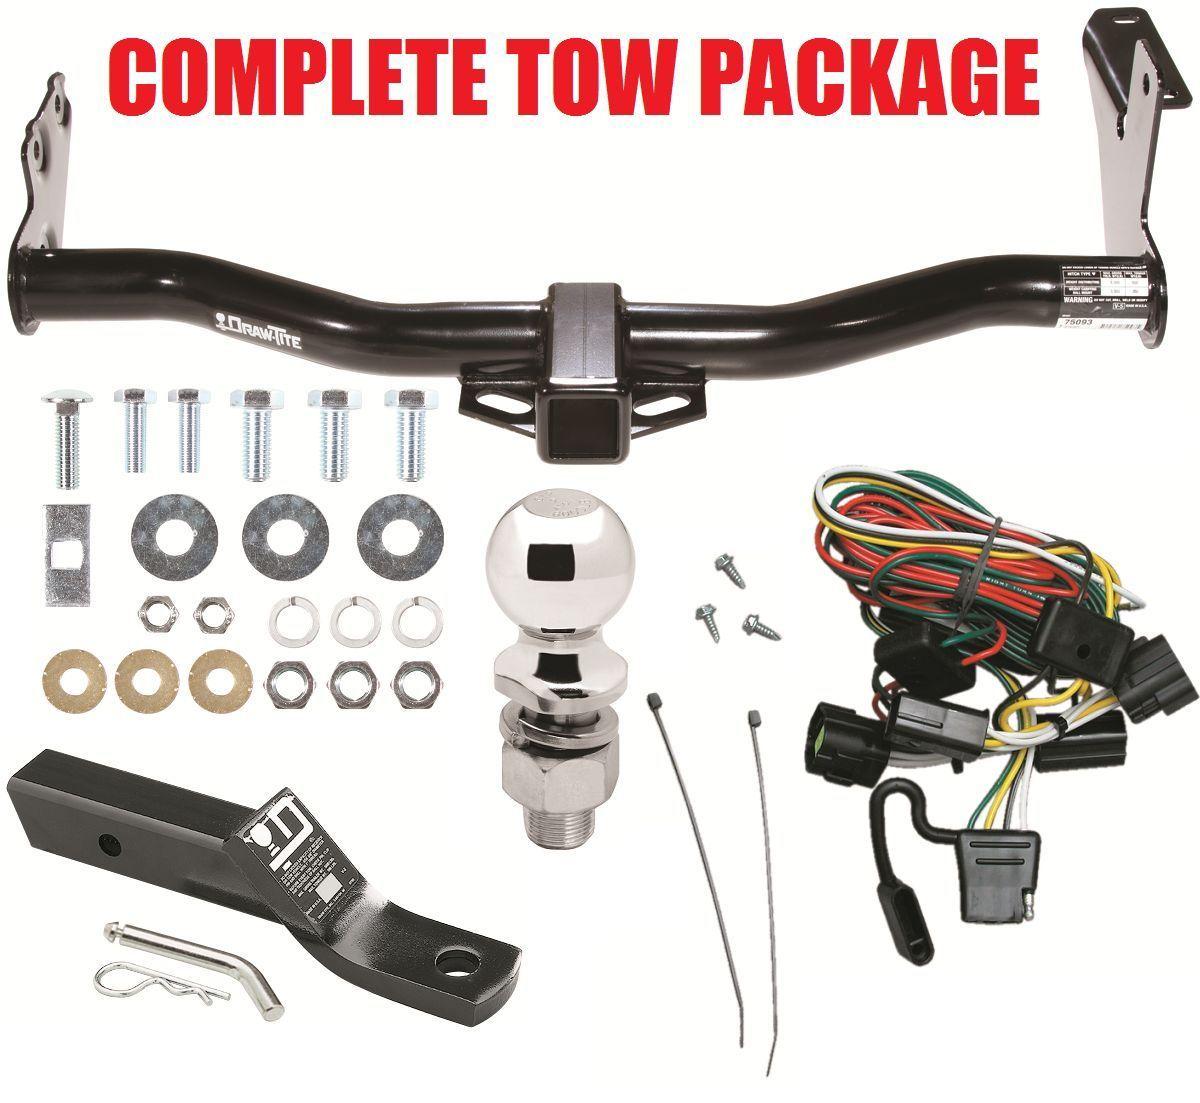 98 04 Isuzu Rodeo W Under Vehicle Spare And 29 Similar Items Wiring For Kgrhqj Oqfb F0dyl1bqeik 2qu 60 57